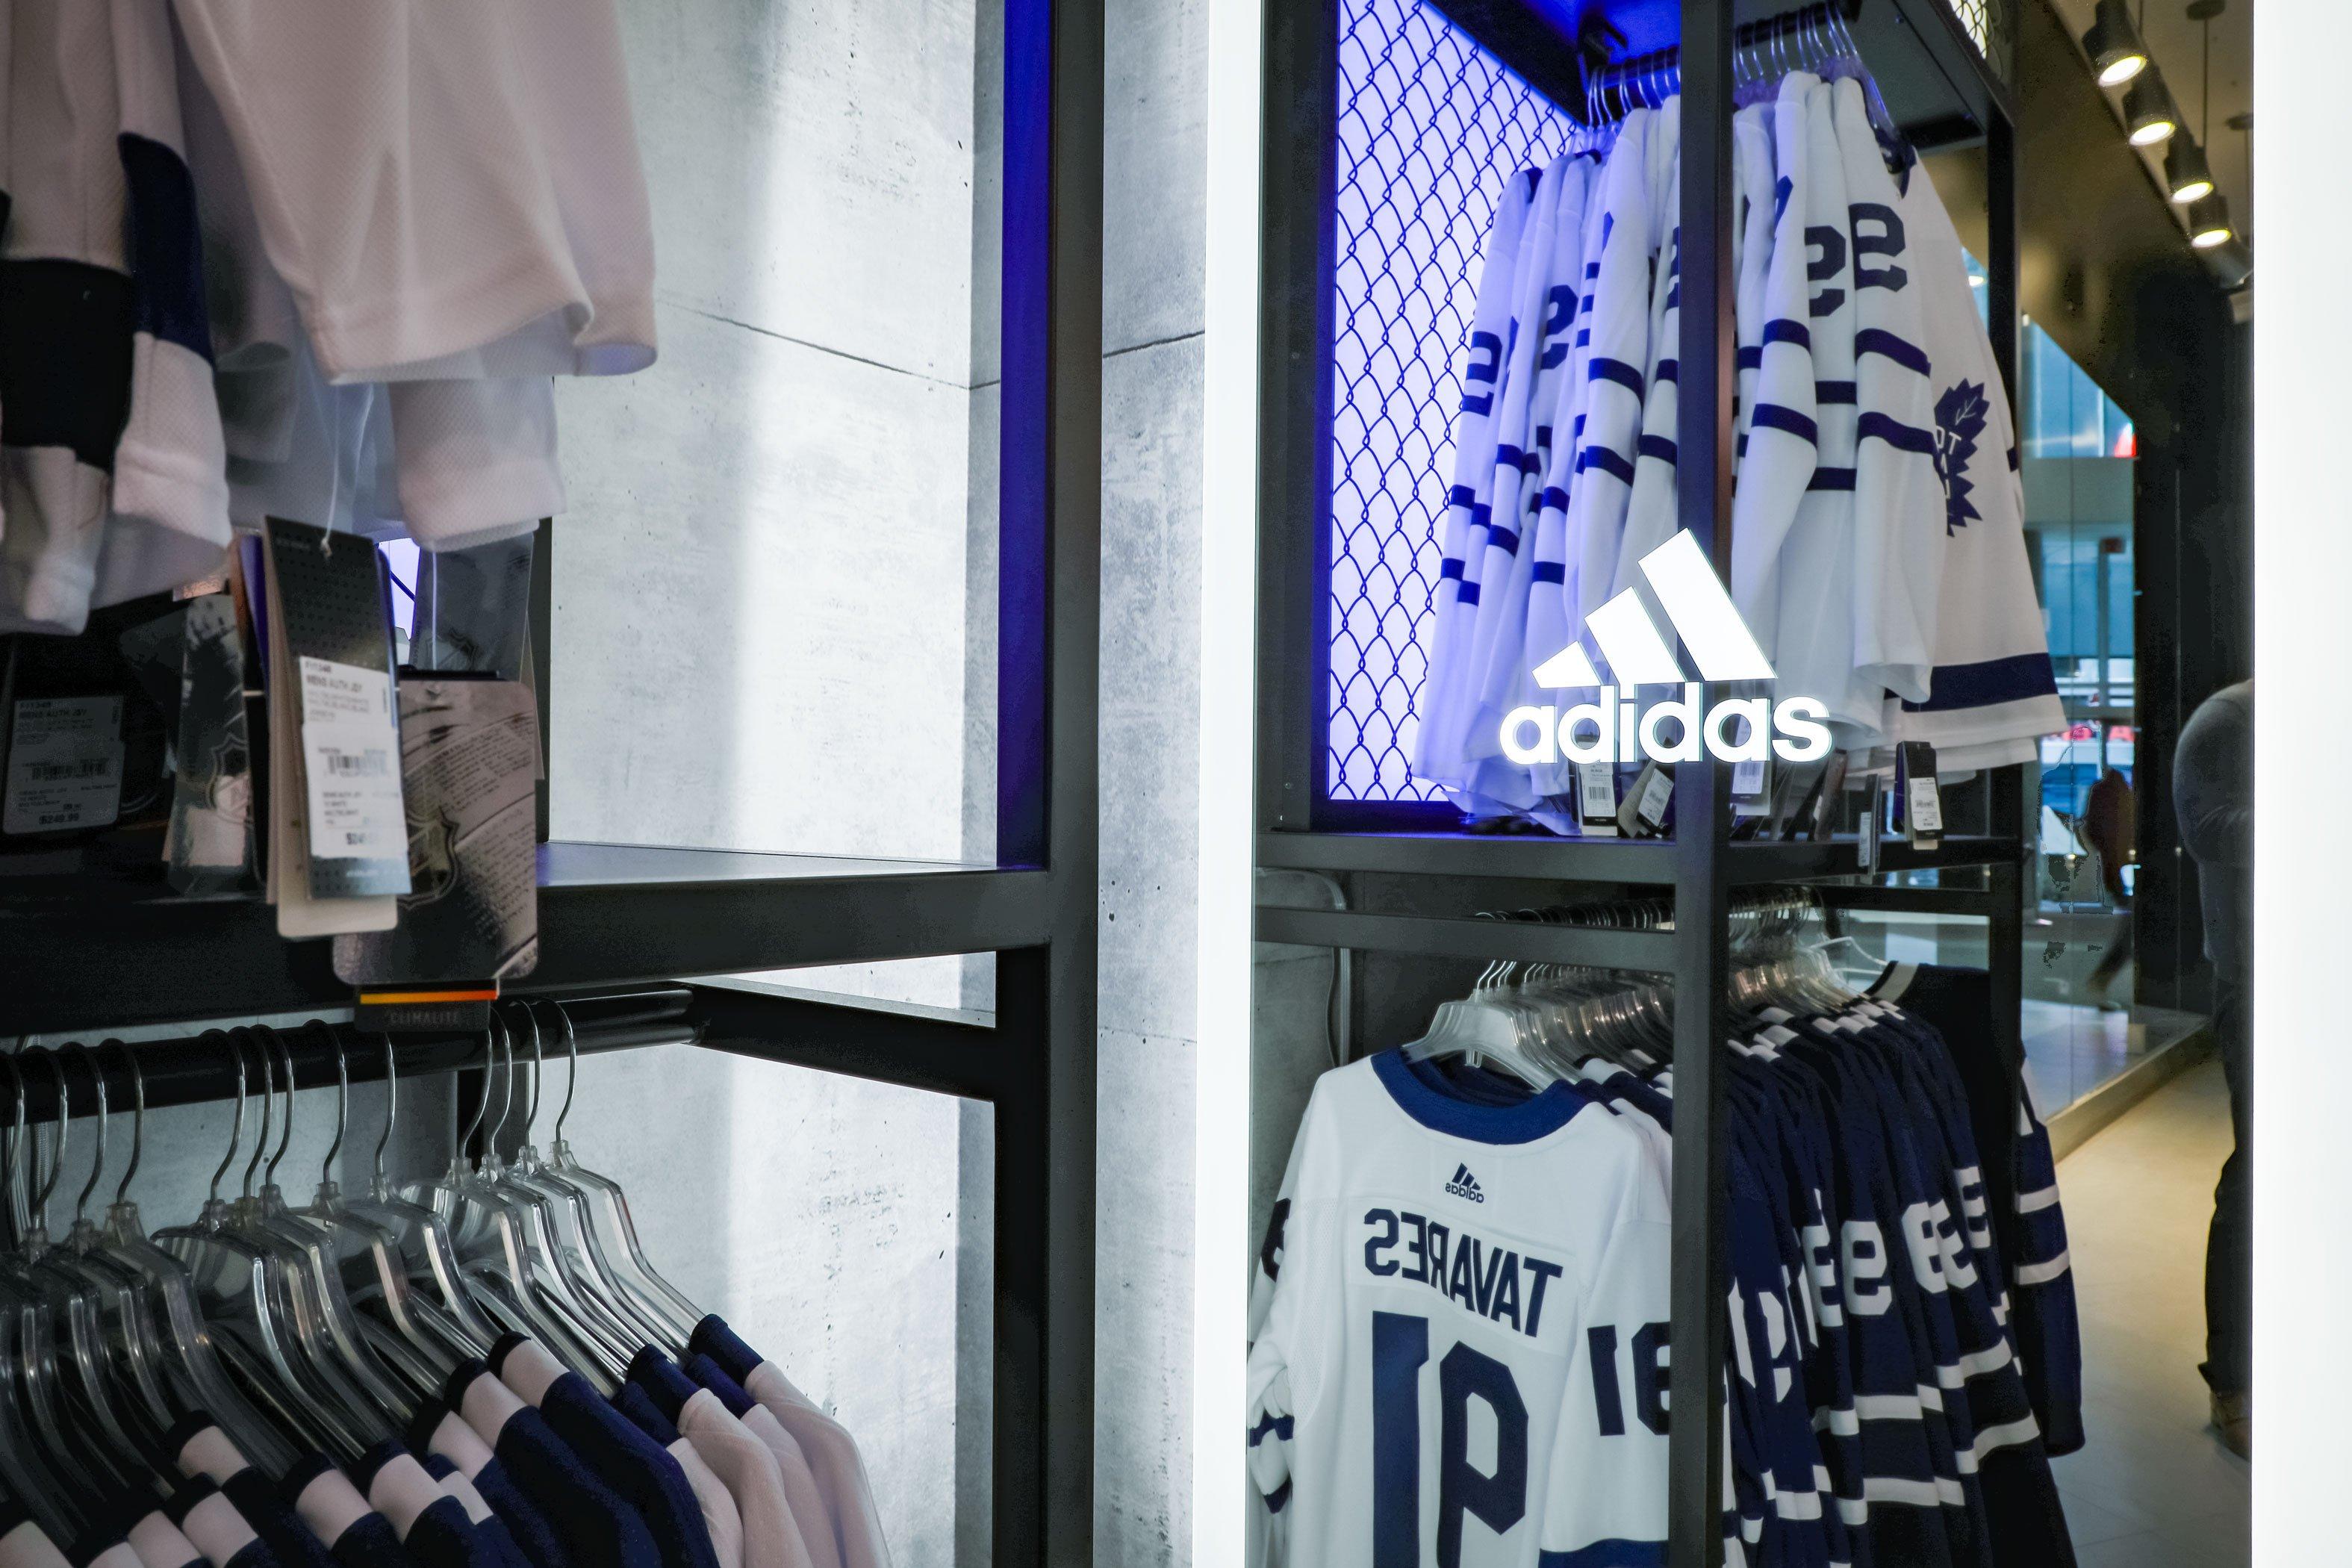 ASTOUND_adidas_2019_SportChekMapleLeafSquare_(4)